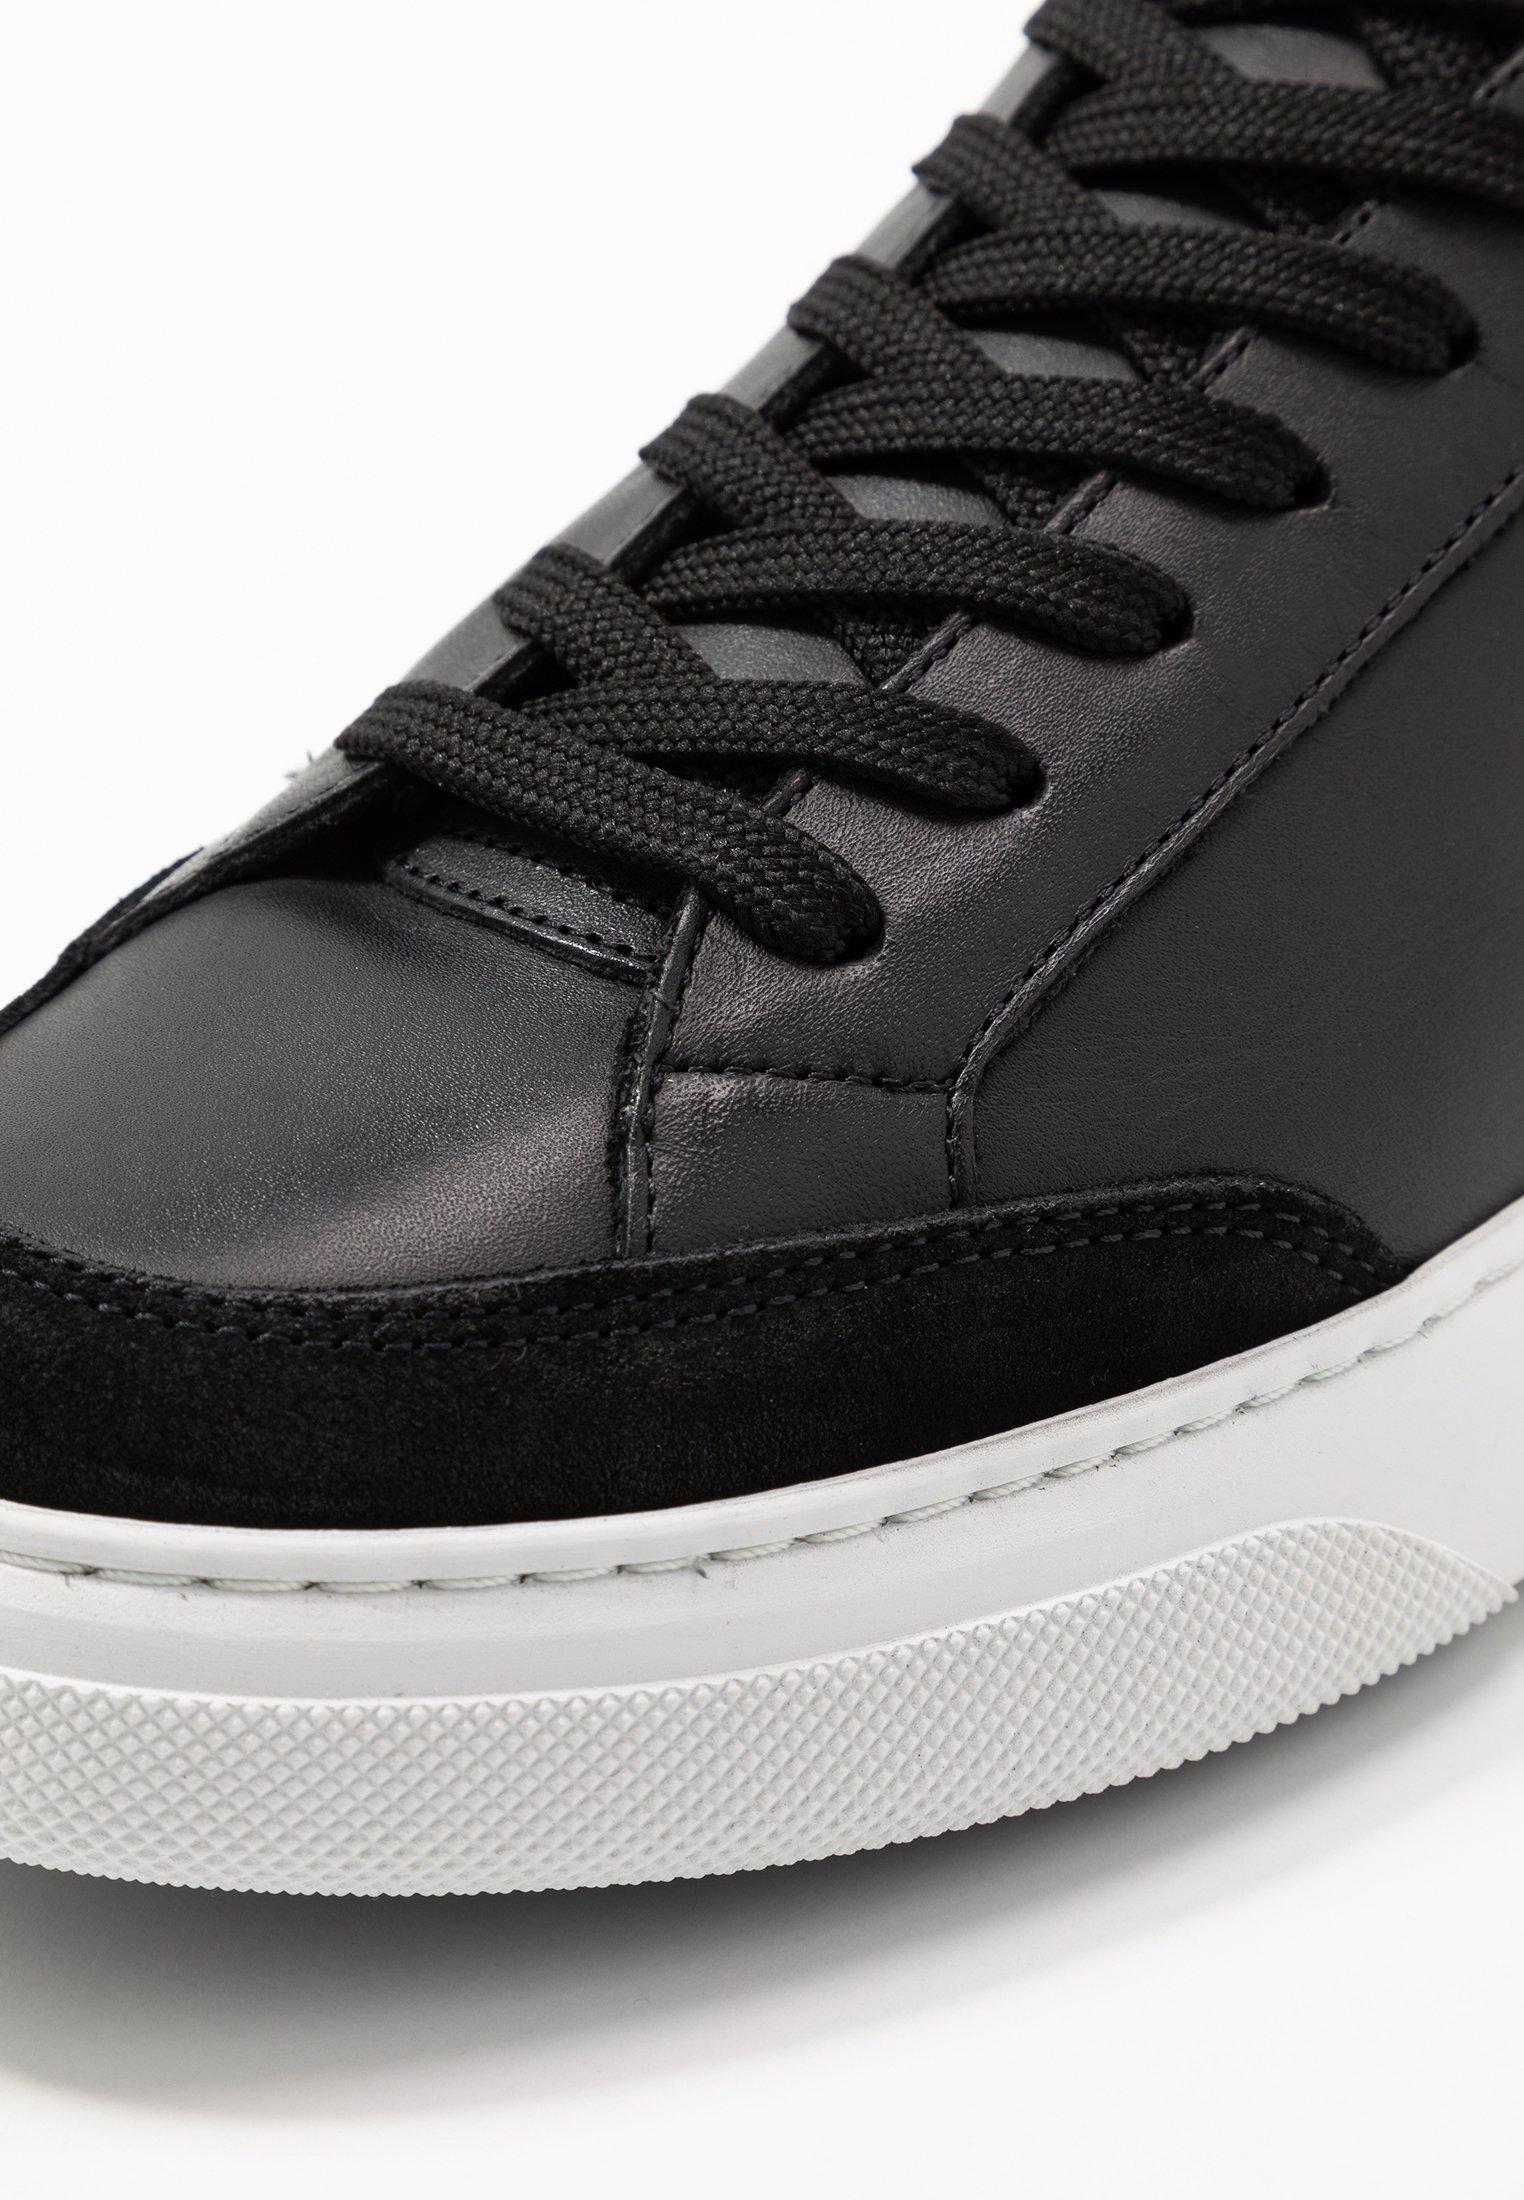 GARMENT PROJECT OFF COURT - Baskets basses - black